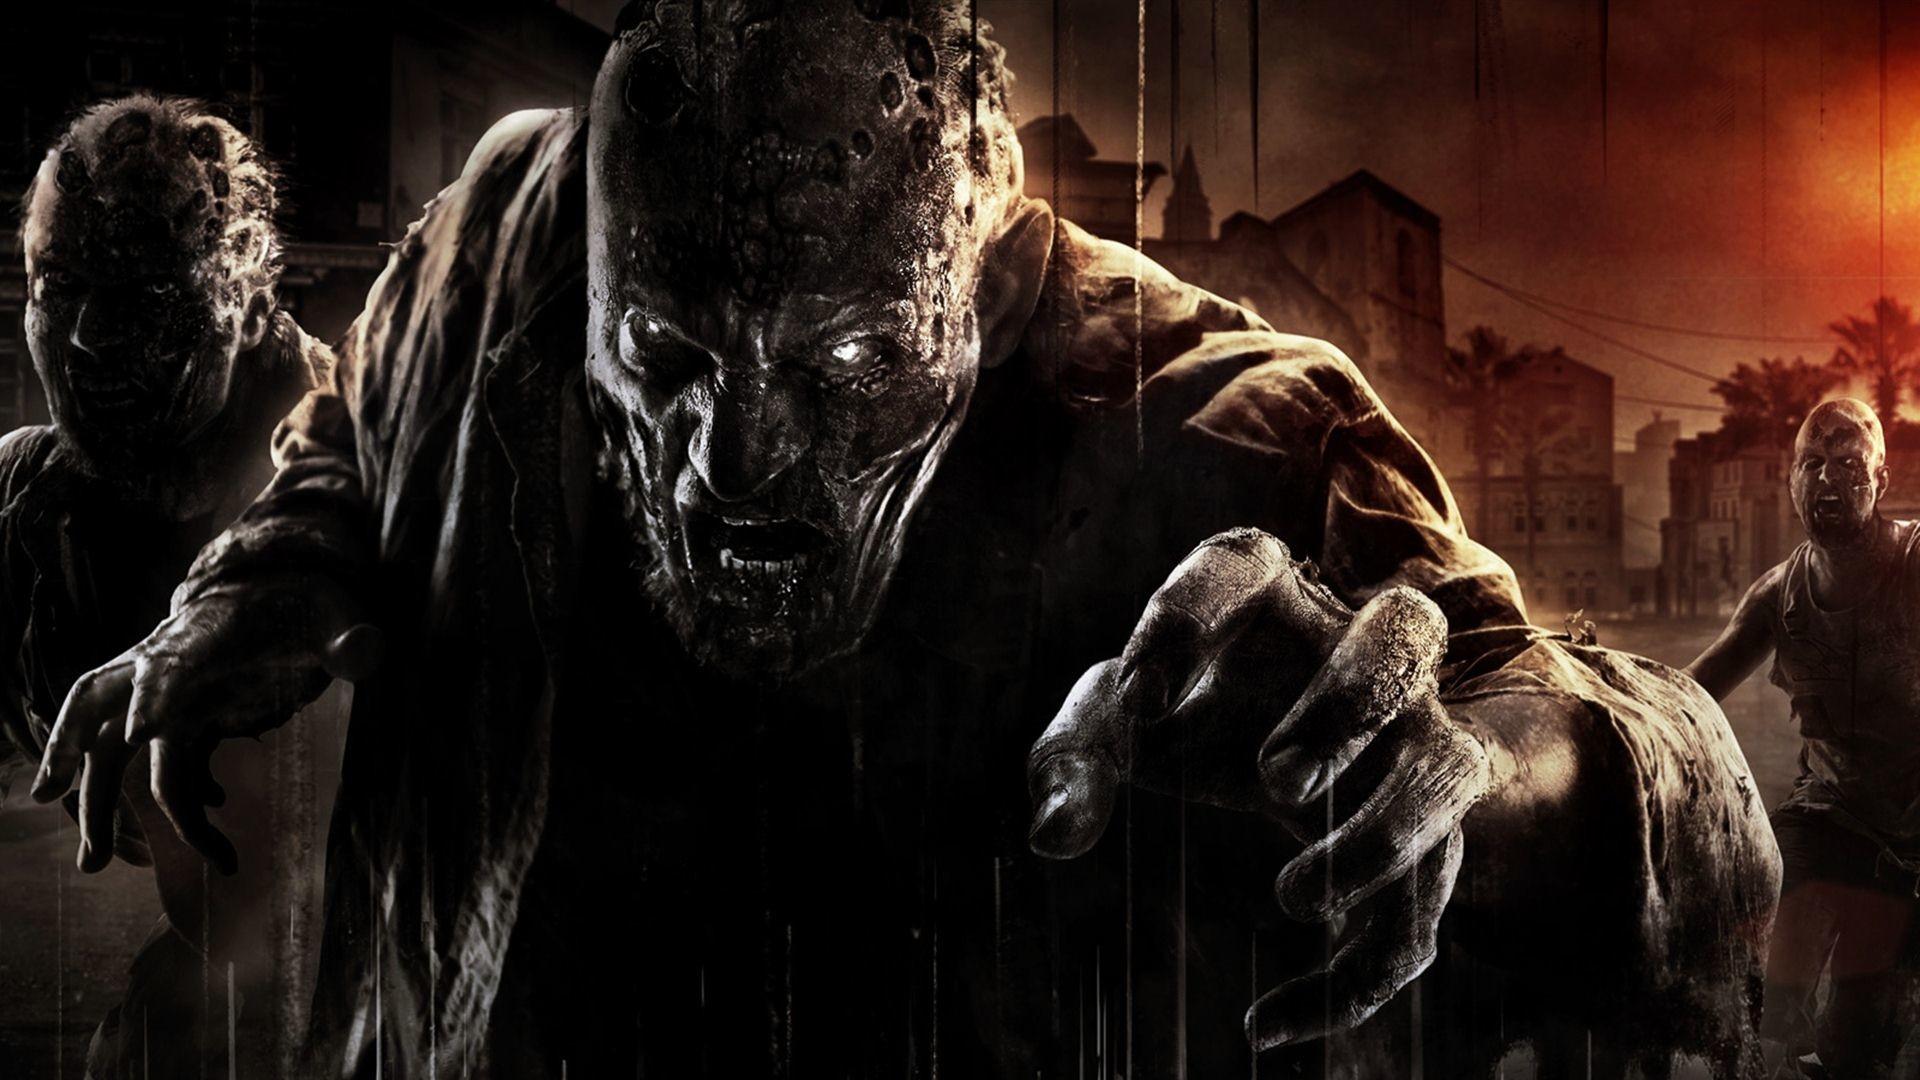 … Zombies Wallpaper Zombies Wallpaper